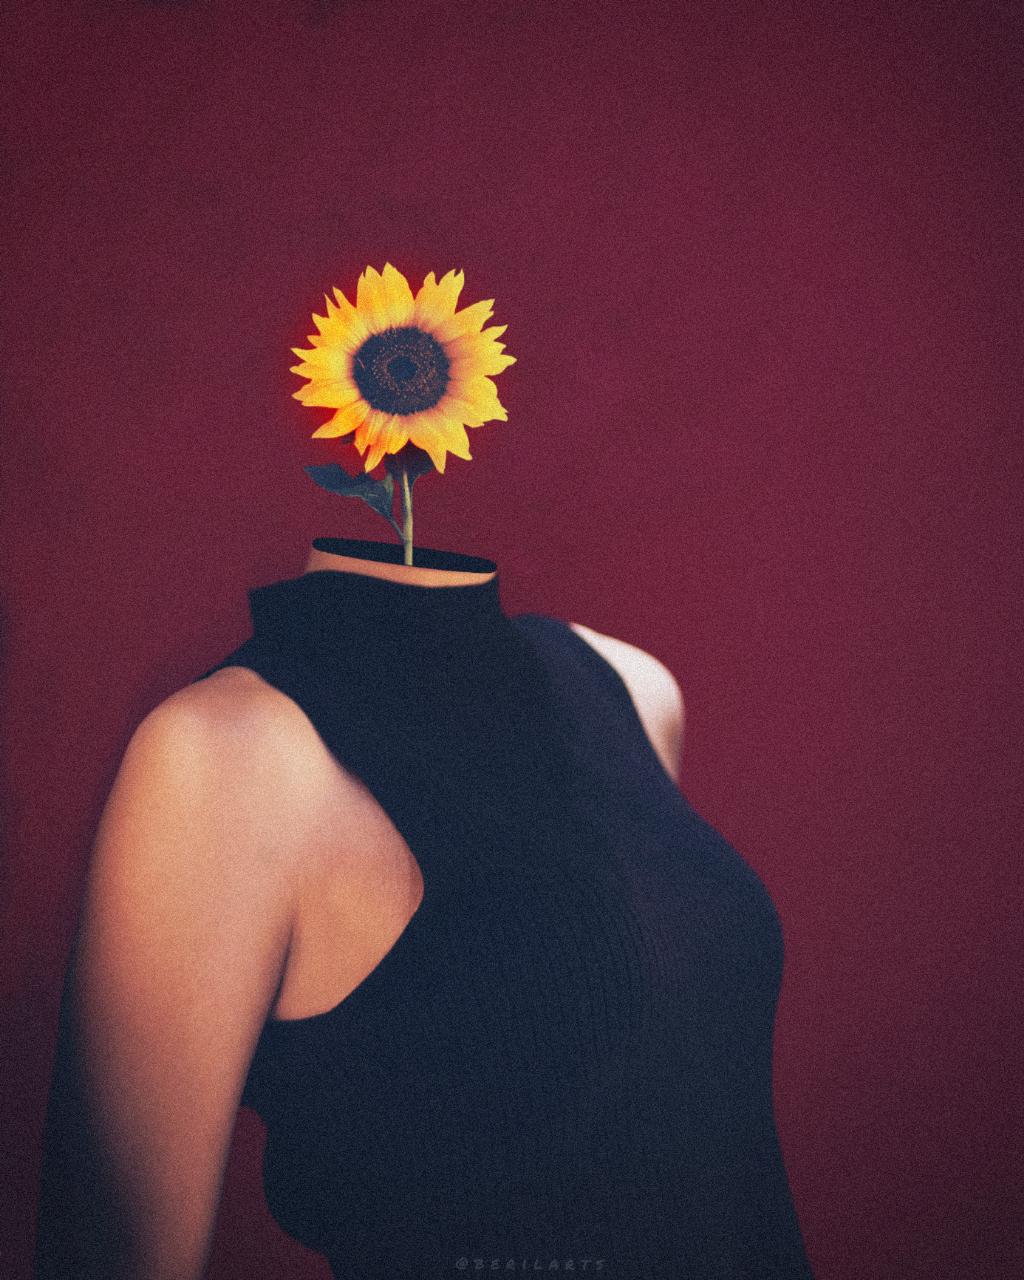 𝘉𝘦𝘢𝘶𝘵𝘪𝘧𝘶𝘭 𝘮𝘪𝘯𝘥𝘴 𝘪𝘯𝘴𝘱𝘪𝘳𝘦 𝘰𝘵𝘩𝘦𝘳𝘴. > https://youtu.be/Y7ix6RITXM0  #freetoedit   #sunflower   @berilarts         🌻